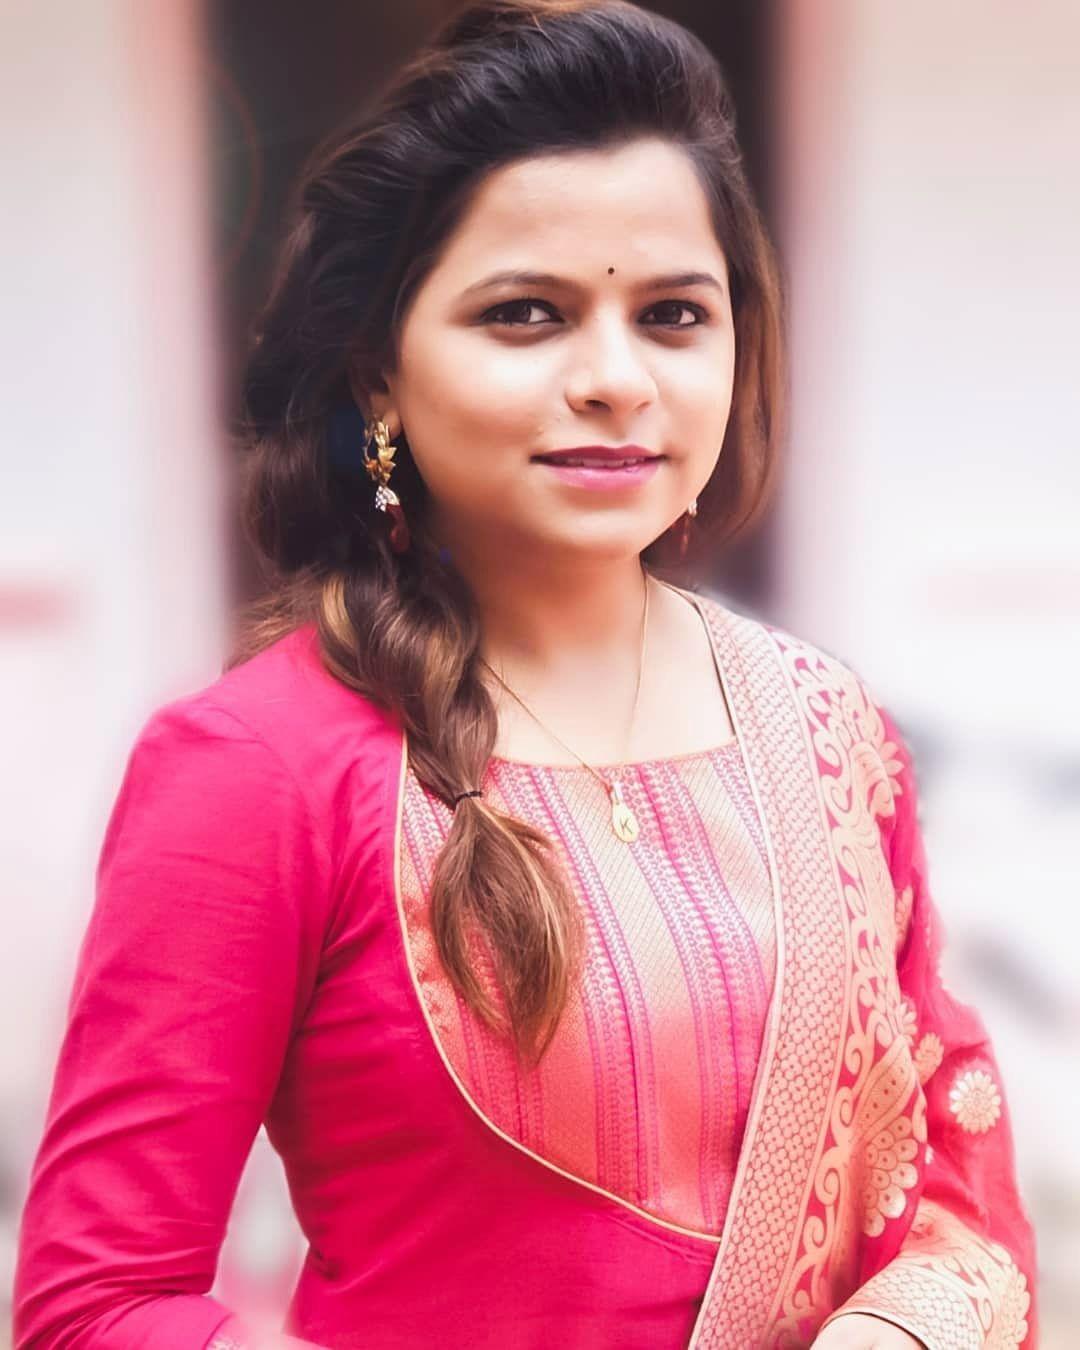 गायिका कार्तिकी गायकवाड |Marathi Singer - Kartiki Gaikwad #kartikigaikwad  #maharashtriangirls | Photo, Girl, N girls